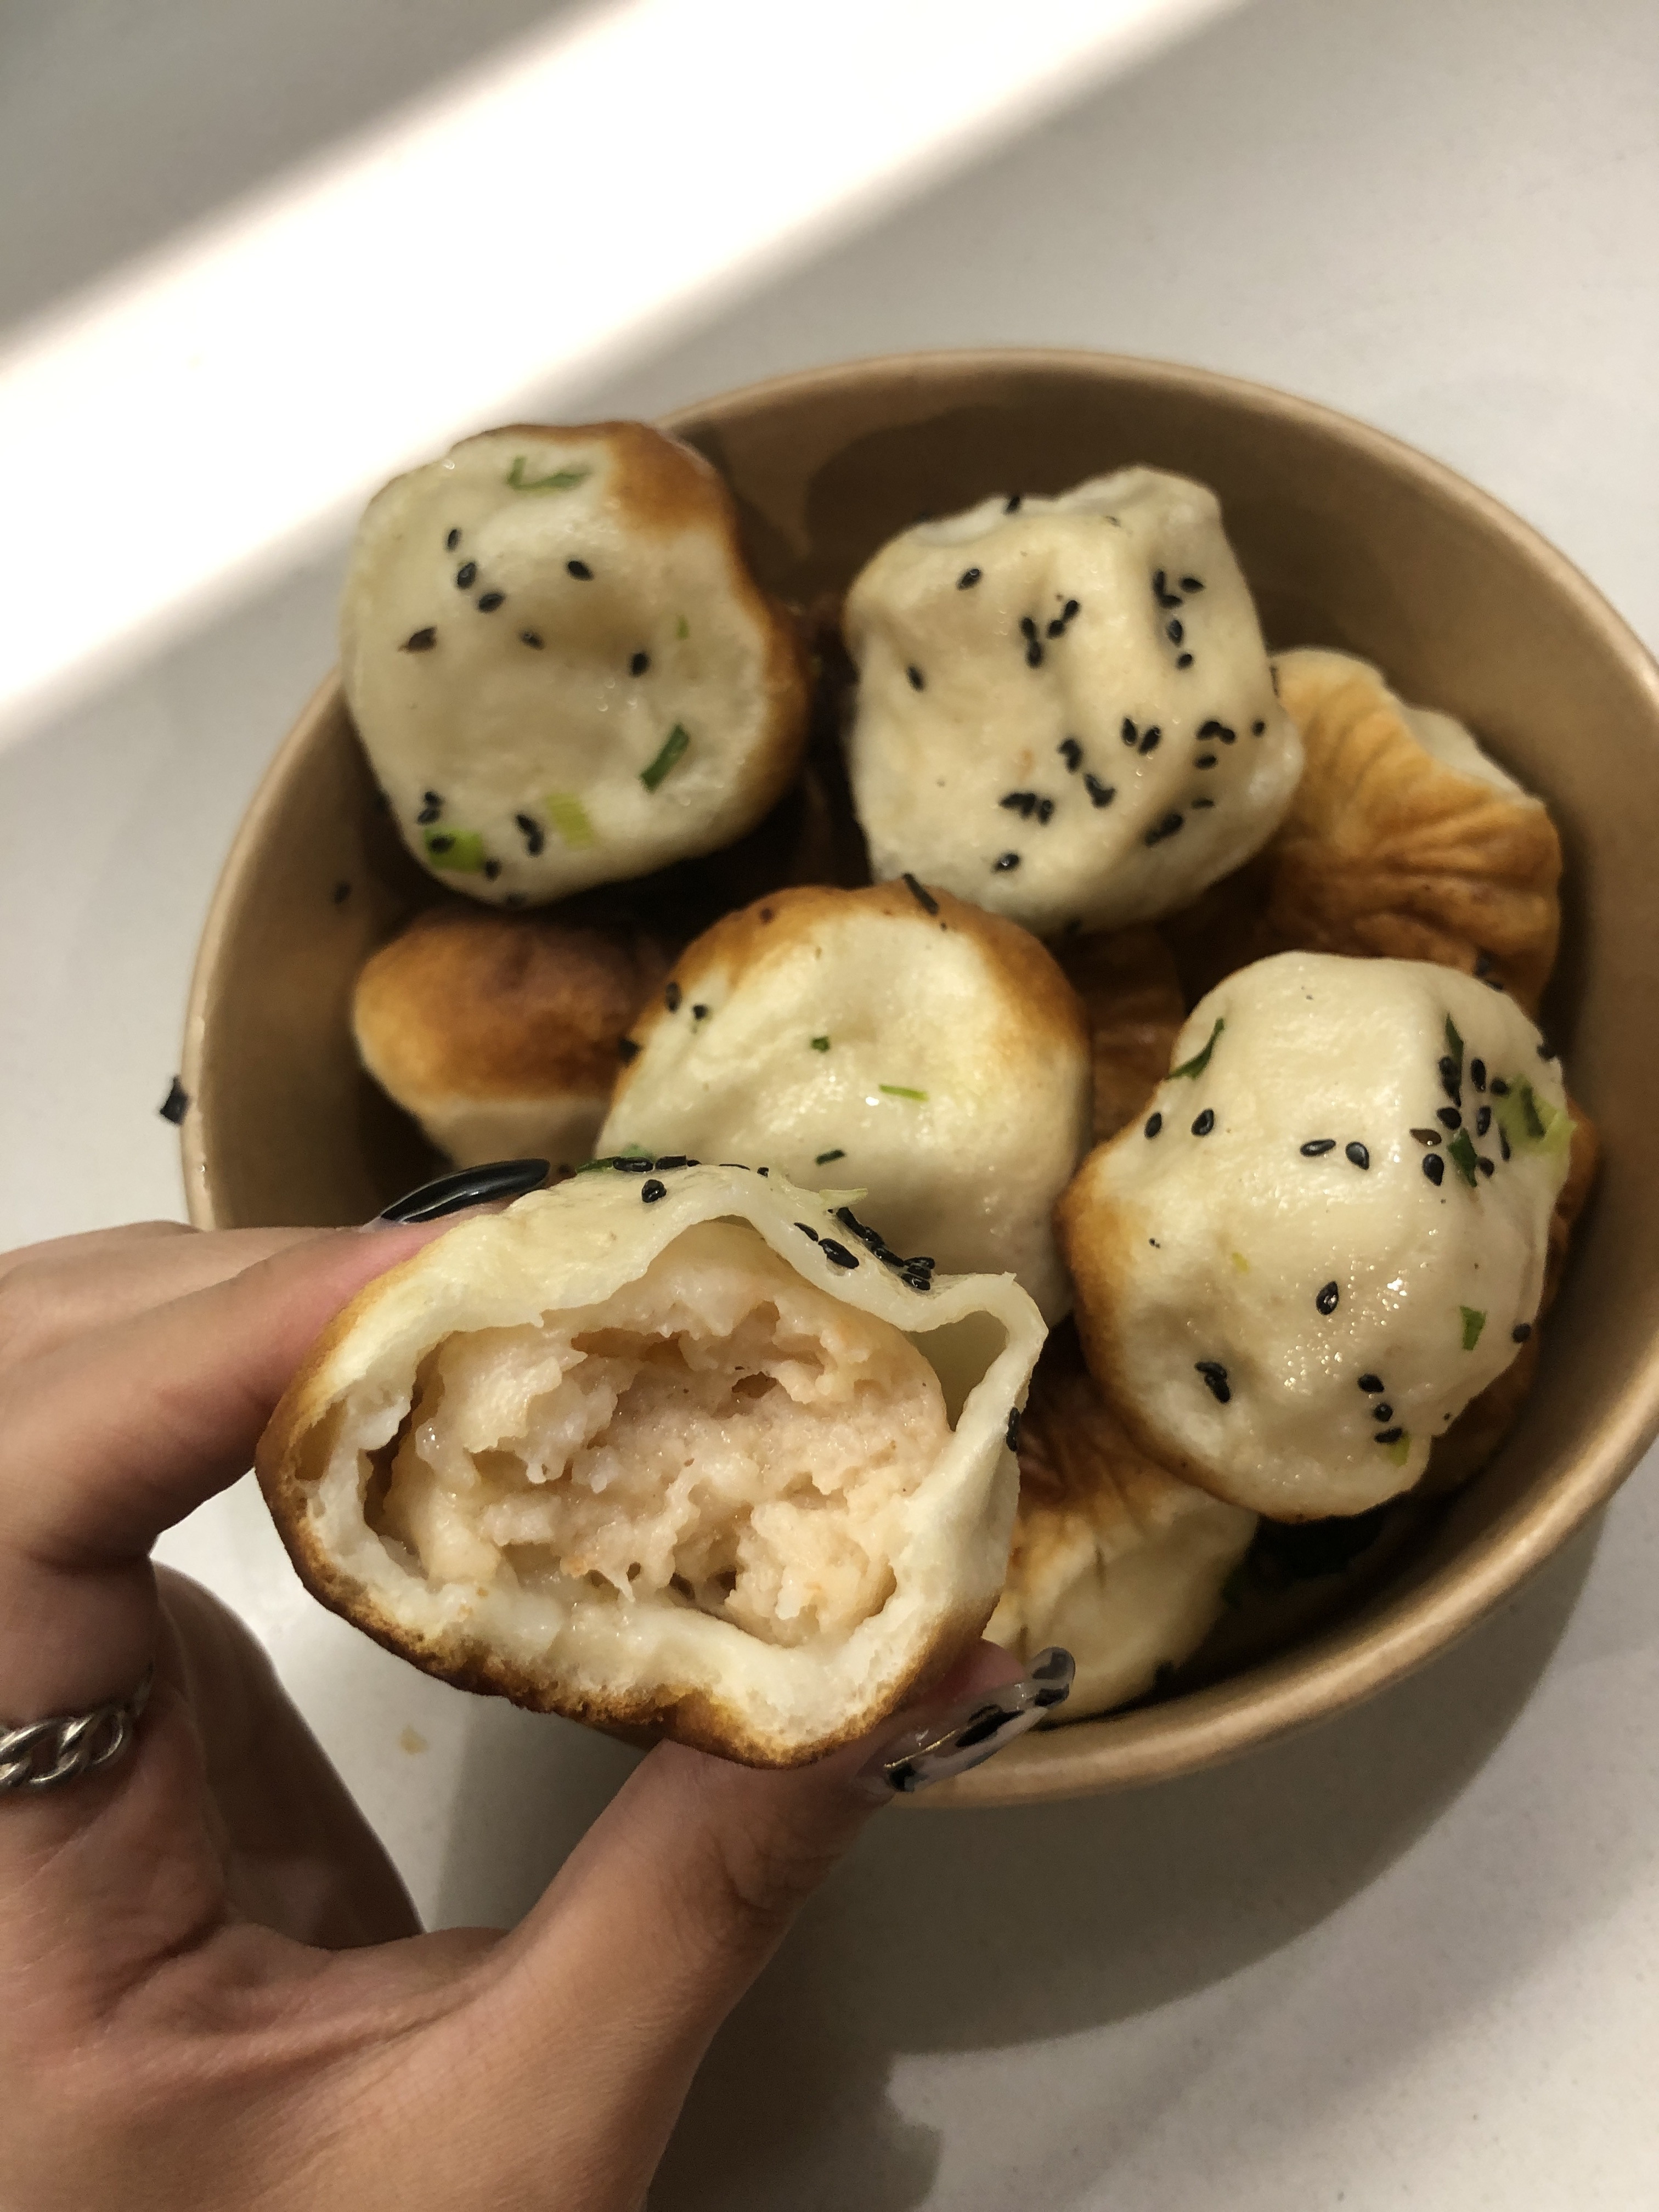 hand holding shrimp dumpling half bitten into